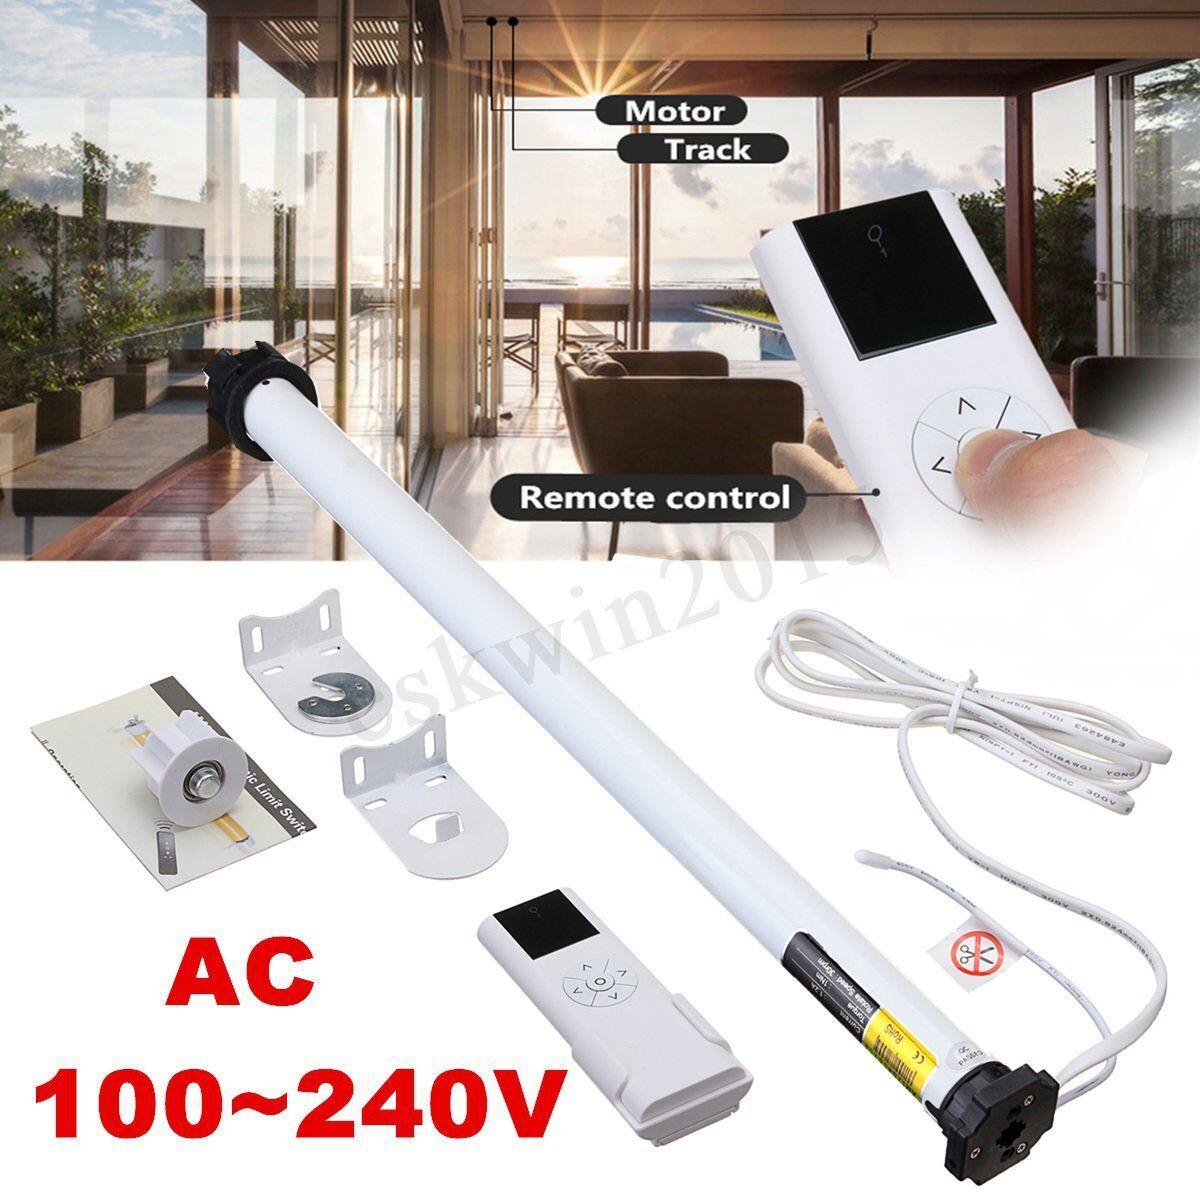 AC 100-240V DIY Electric Roller Blind   Shade Tubular Motor + Remote Control Set